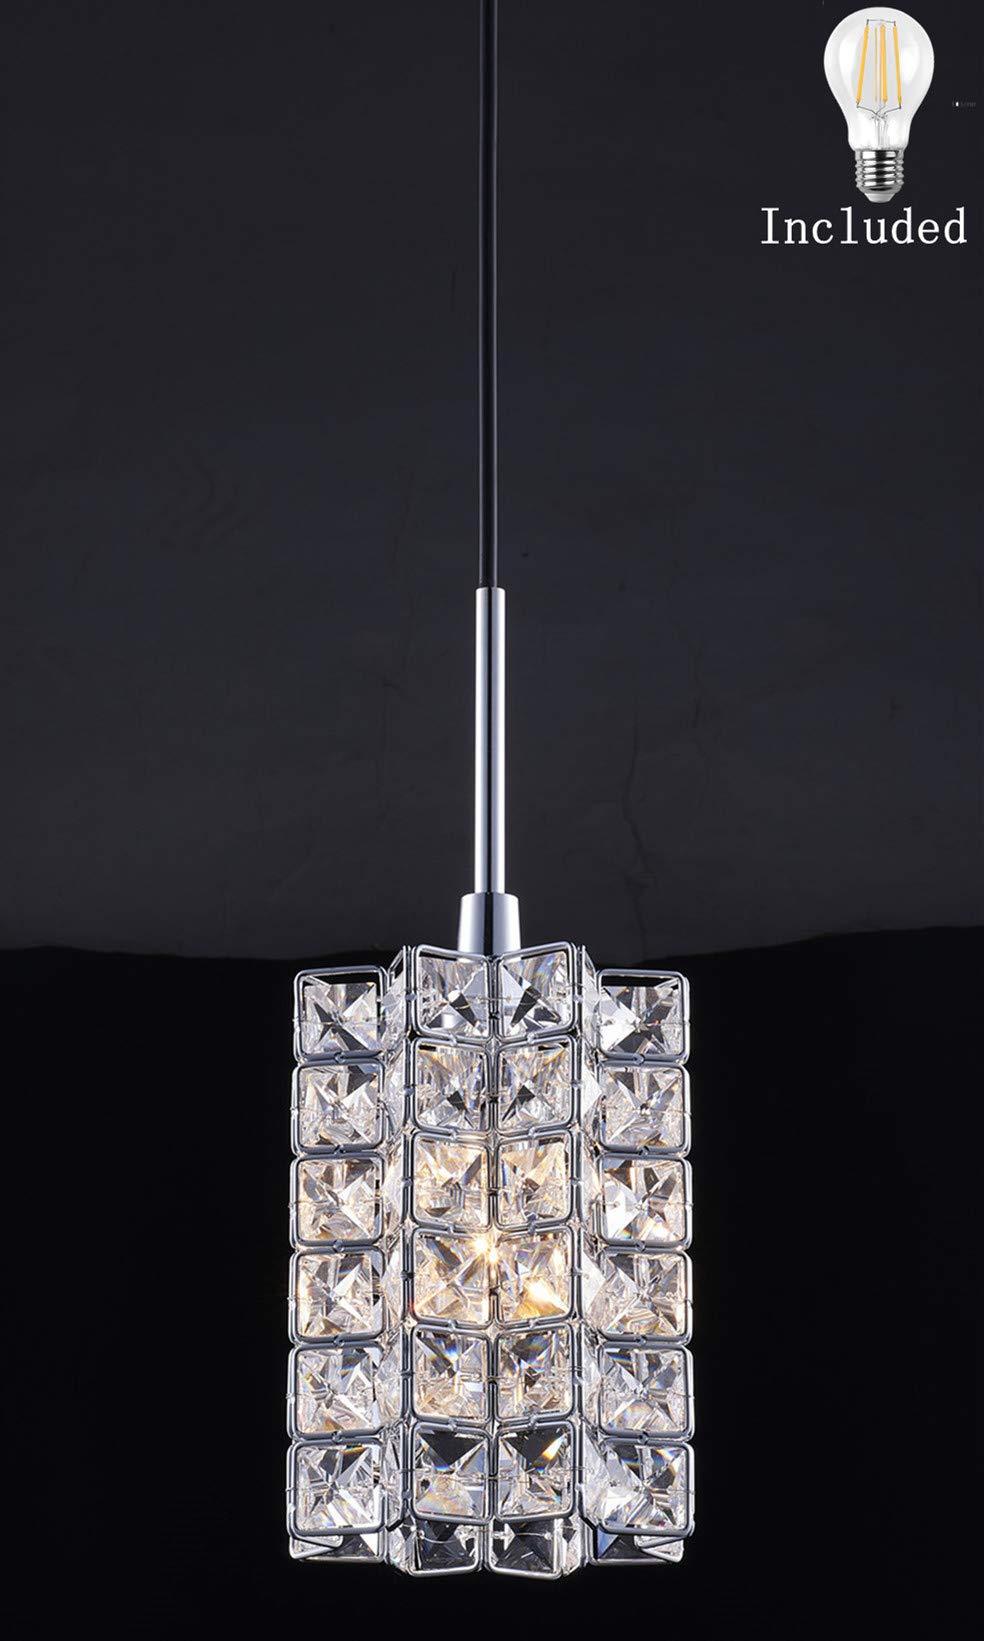 Smart Lighting-Shupregu 1-light pendant lighting, Crystal mini pendant light fixtures,Chrome finish crystal pendant lamp, for Kitchen Island, Dining room, Cafe,Bar,Dimmer LED bulb Included